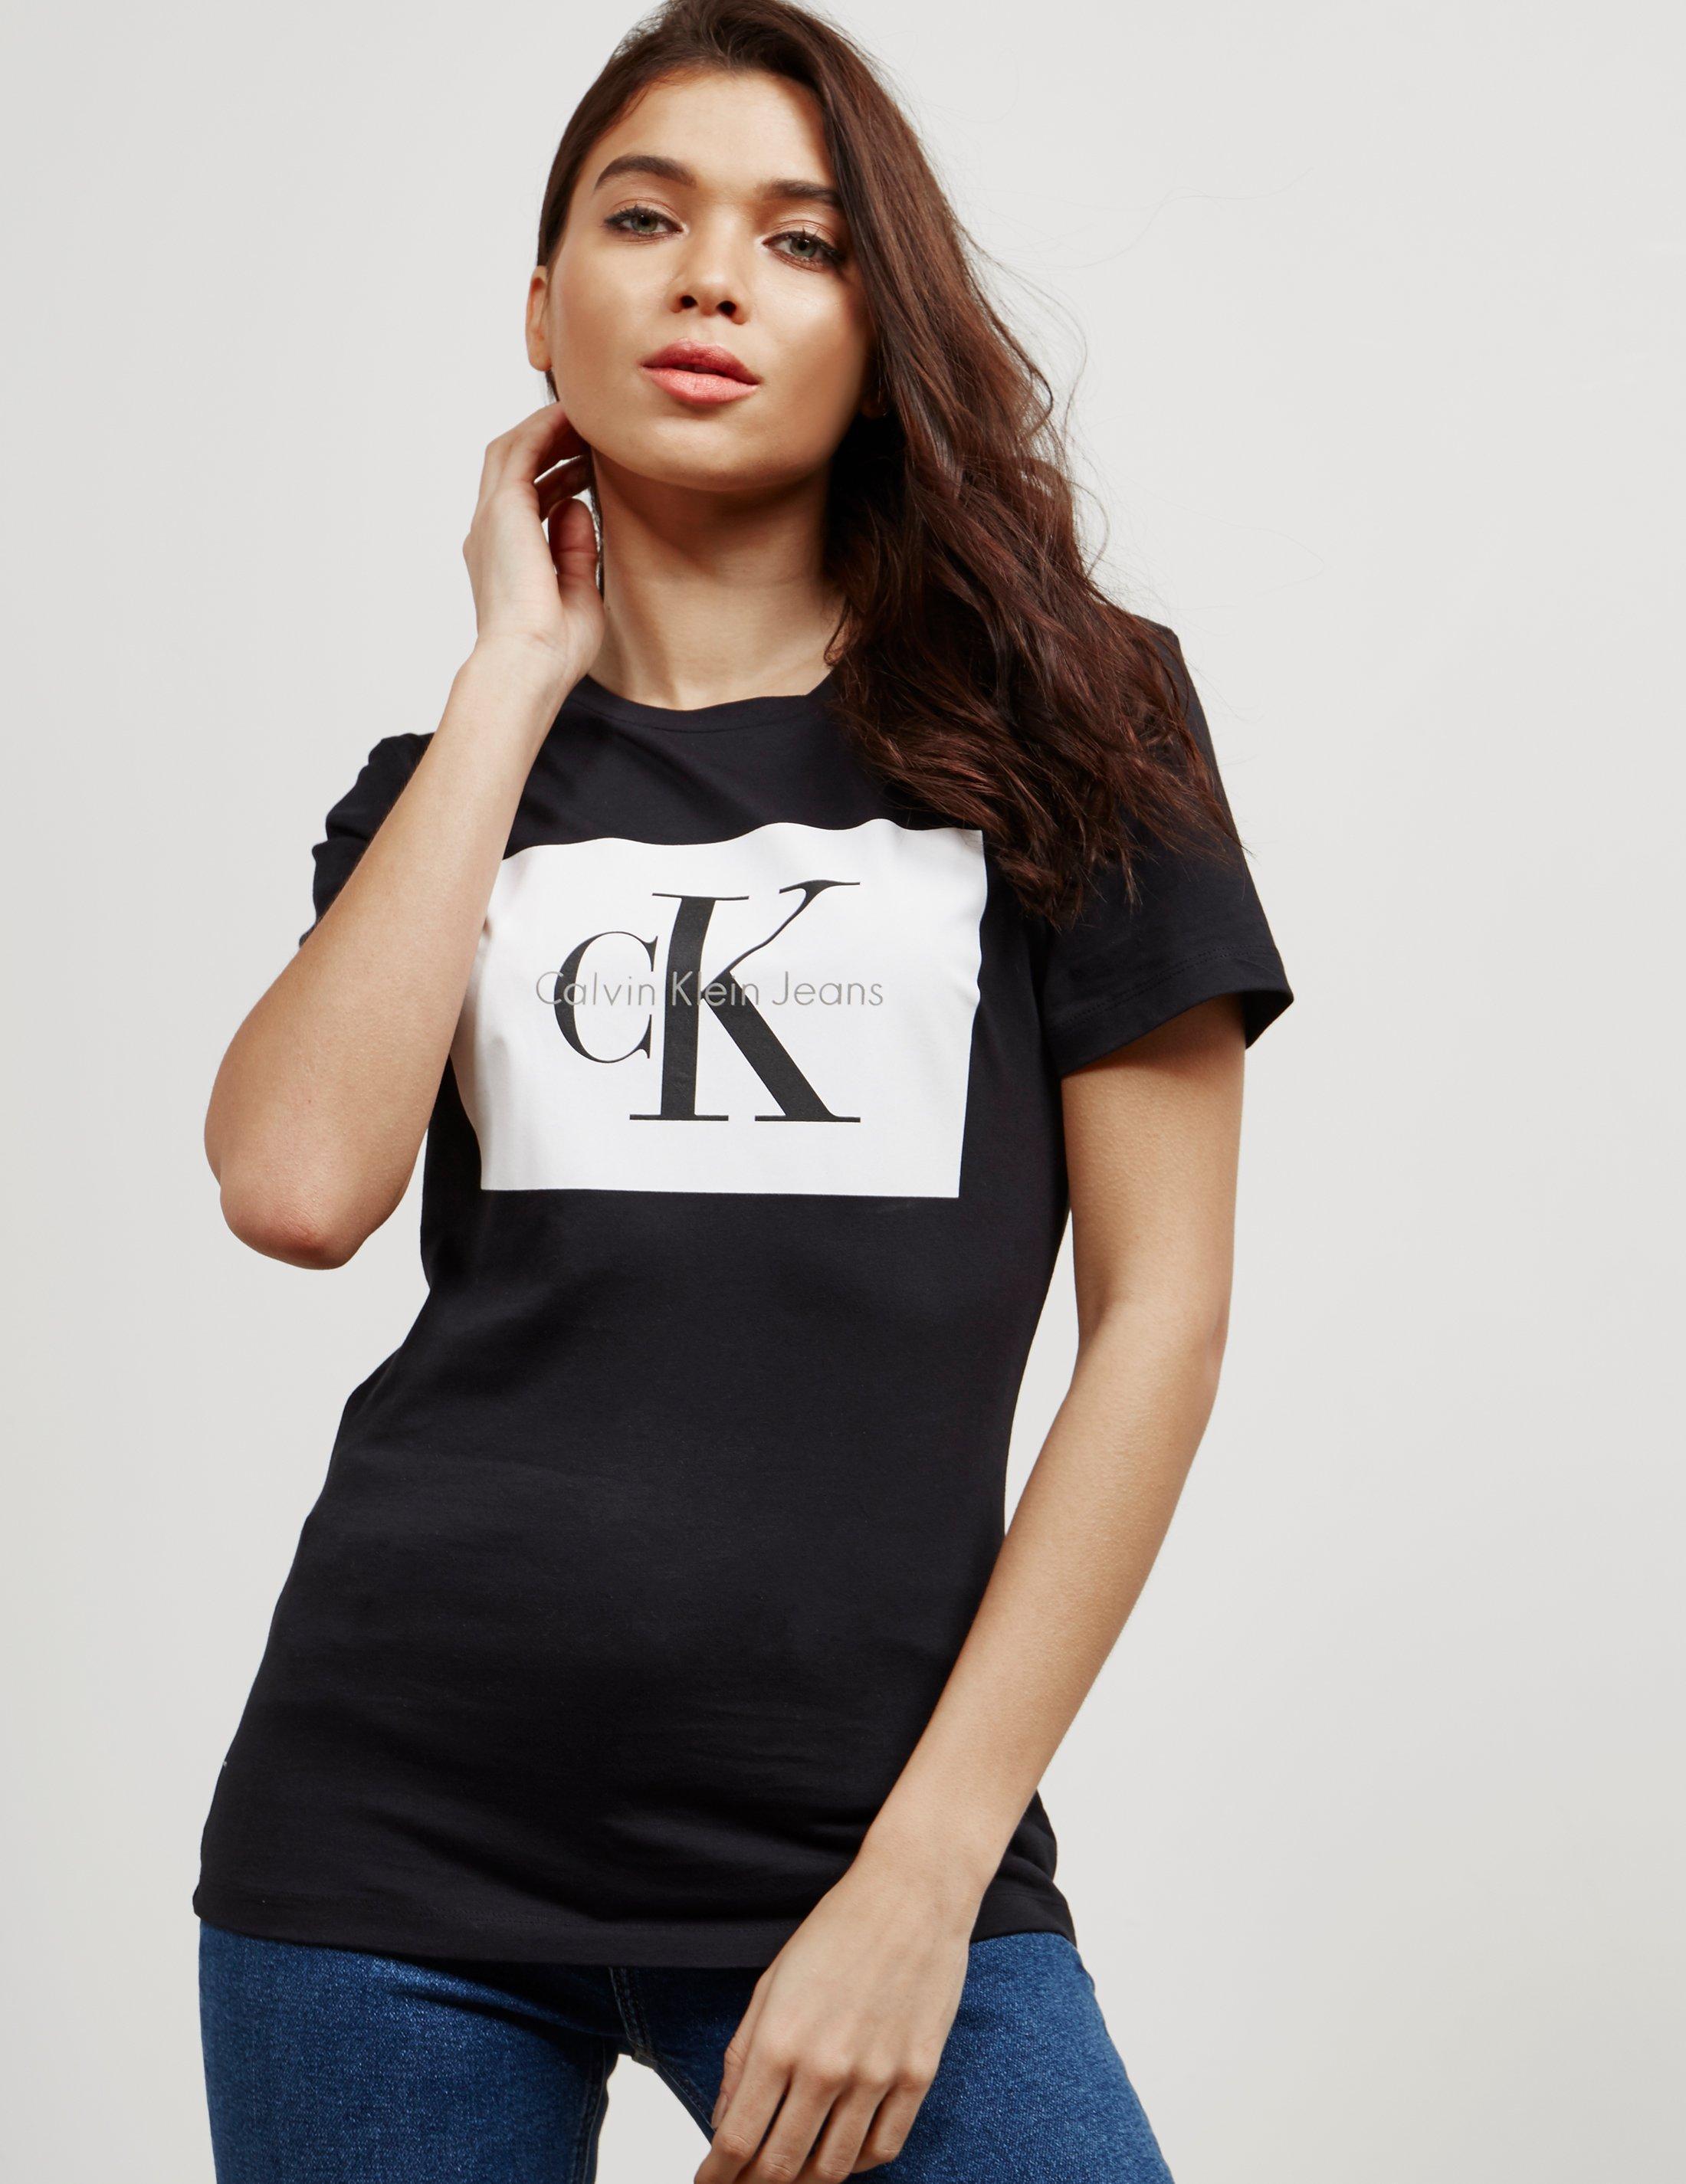 Online Square Klein Womens T Short Calvin Shirt Exclusive Sleeve x067pqpSw